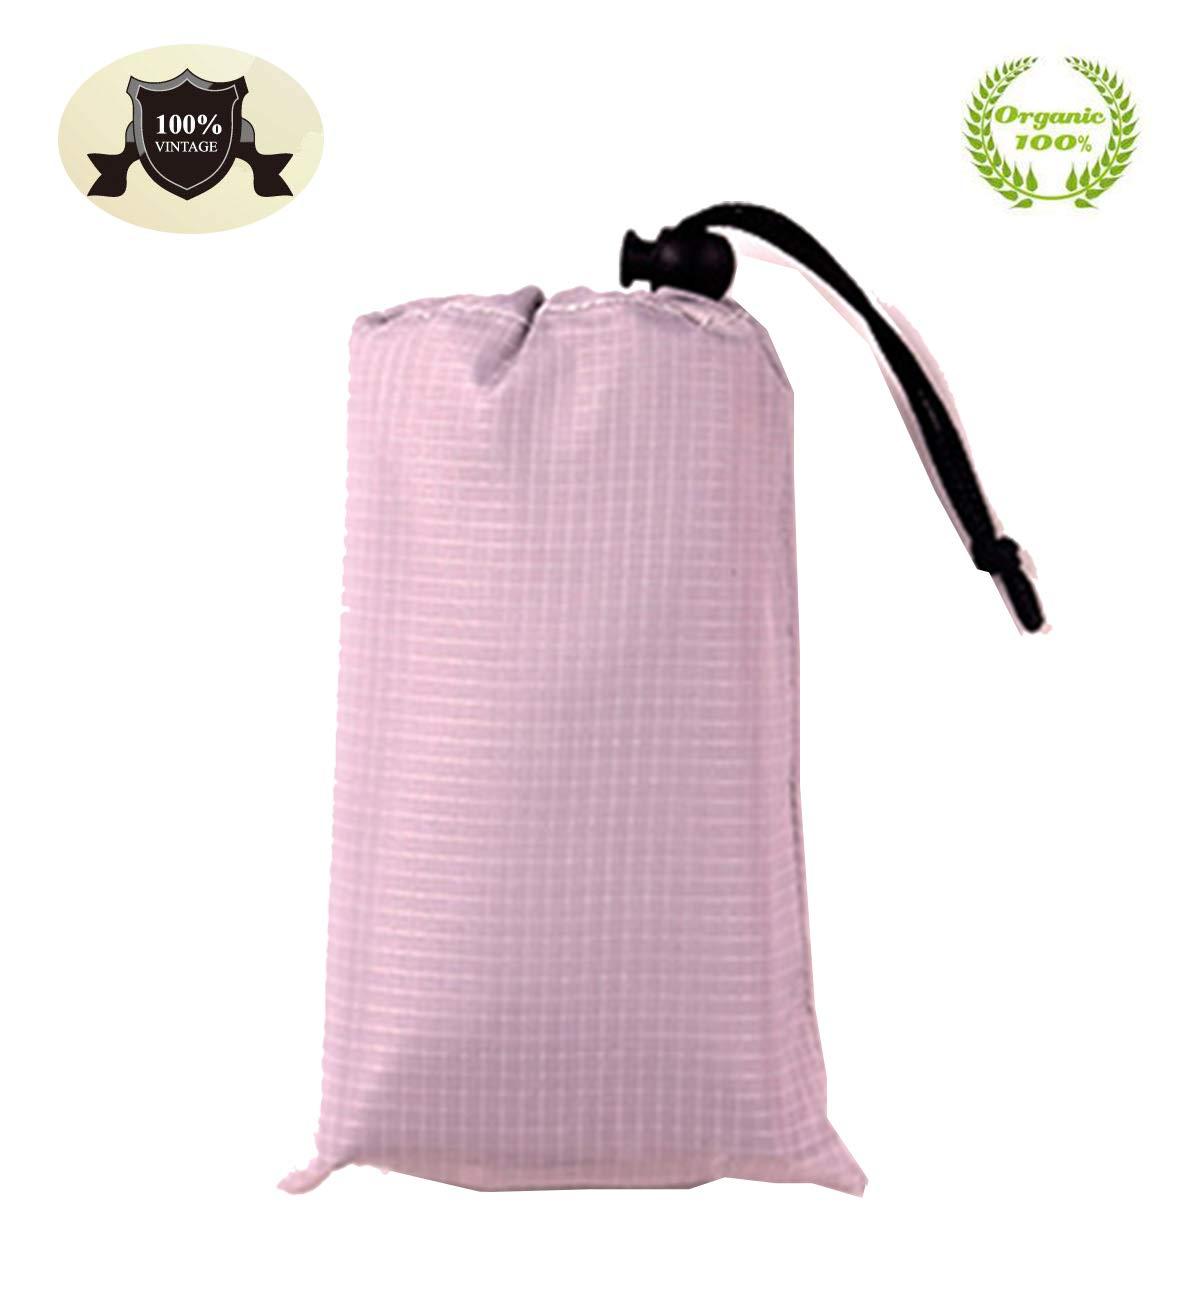 E-Onfoot Lona impermeable para tienda de campa/ña refugio para hamacas cubierta de lluvia